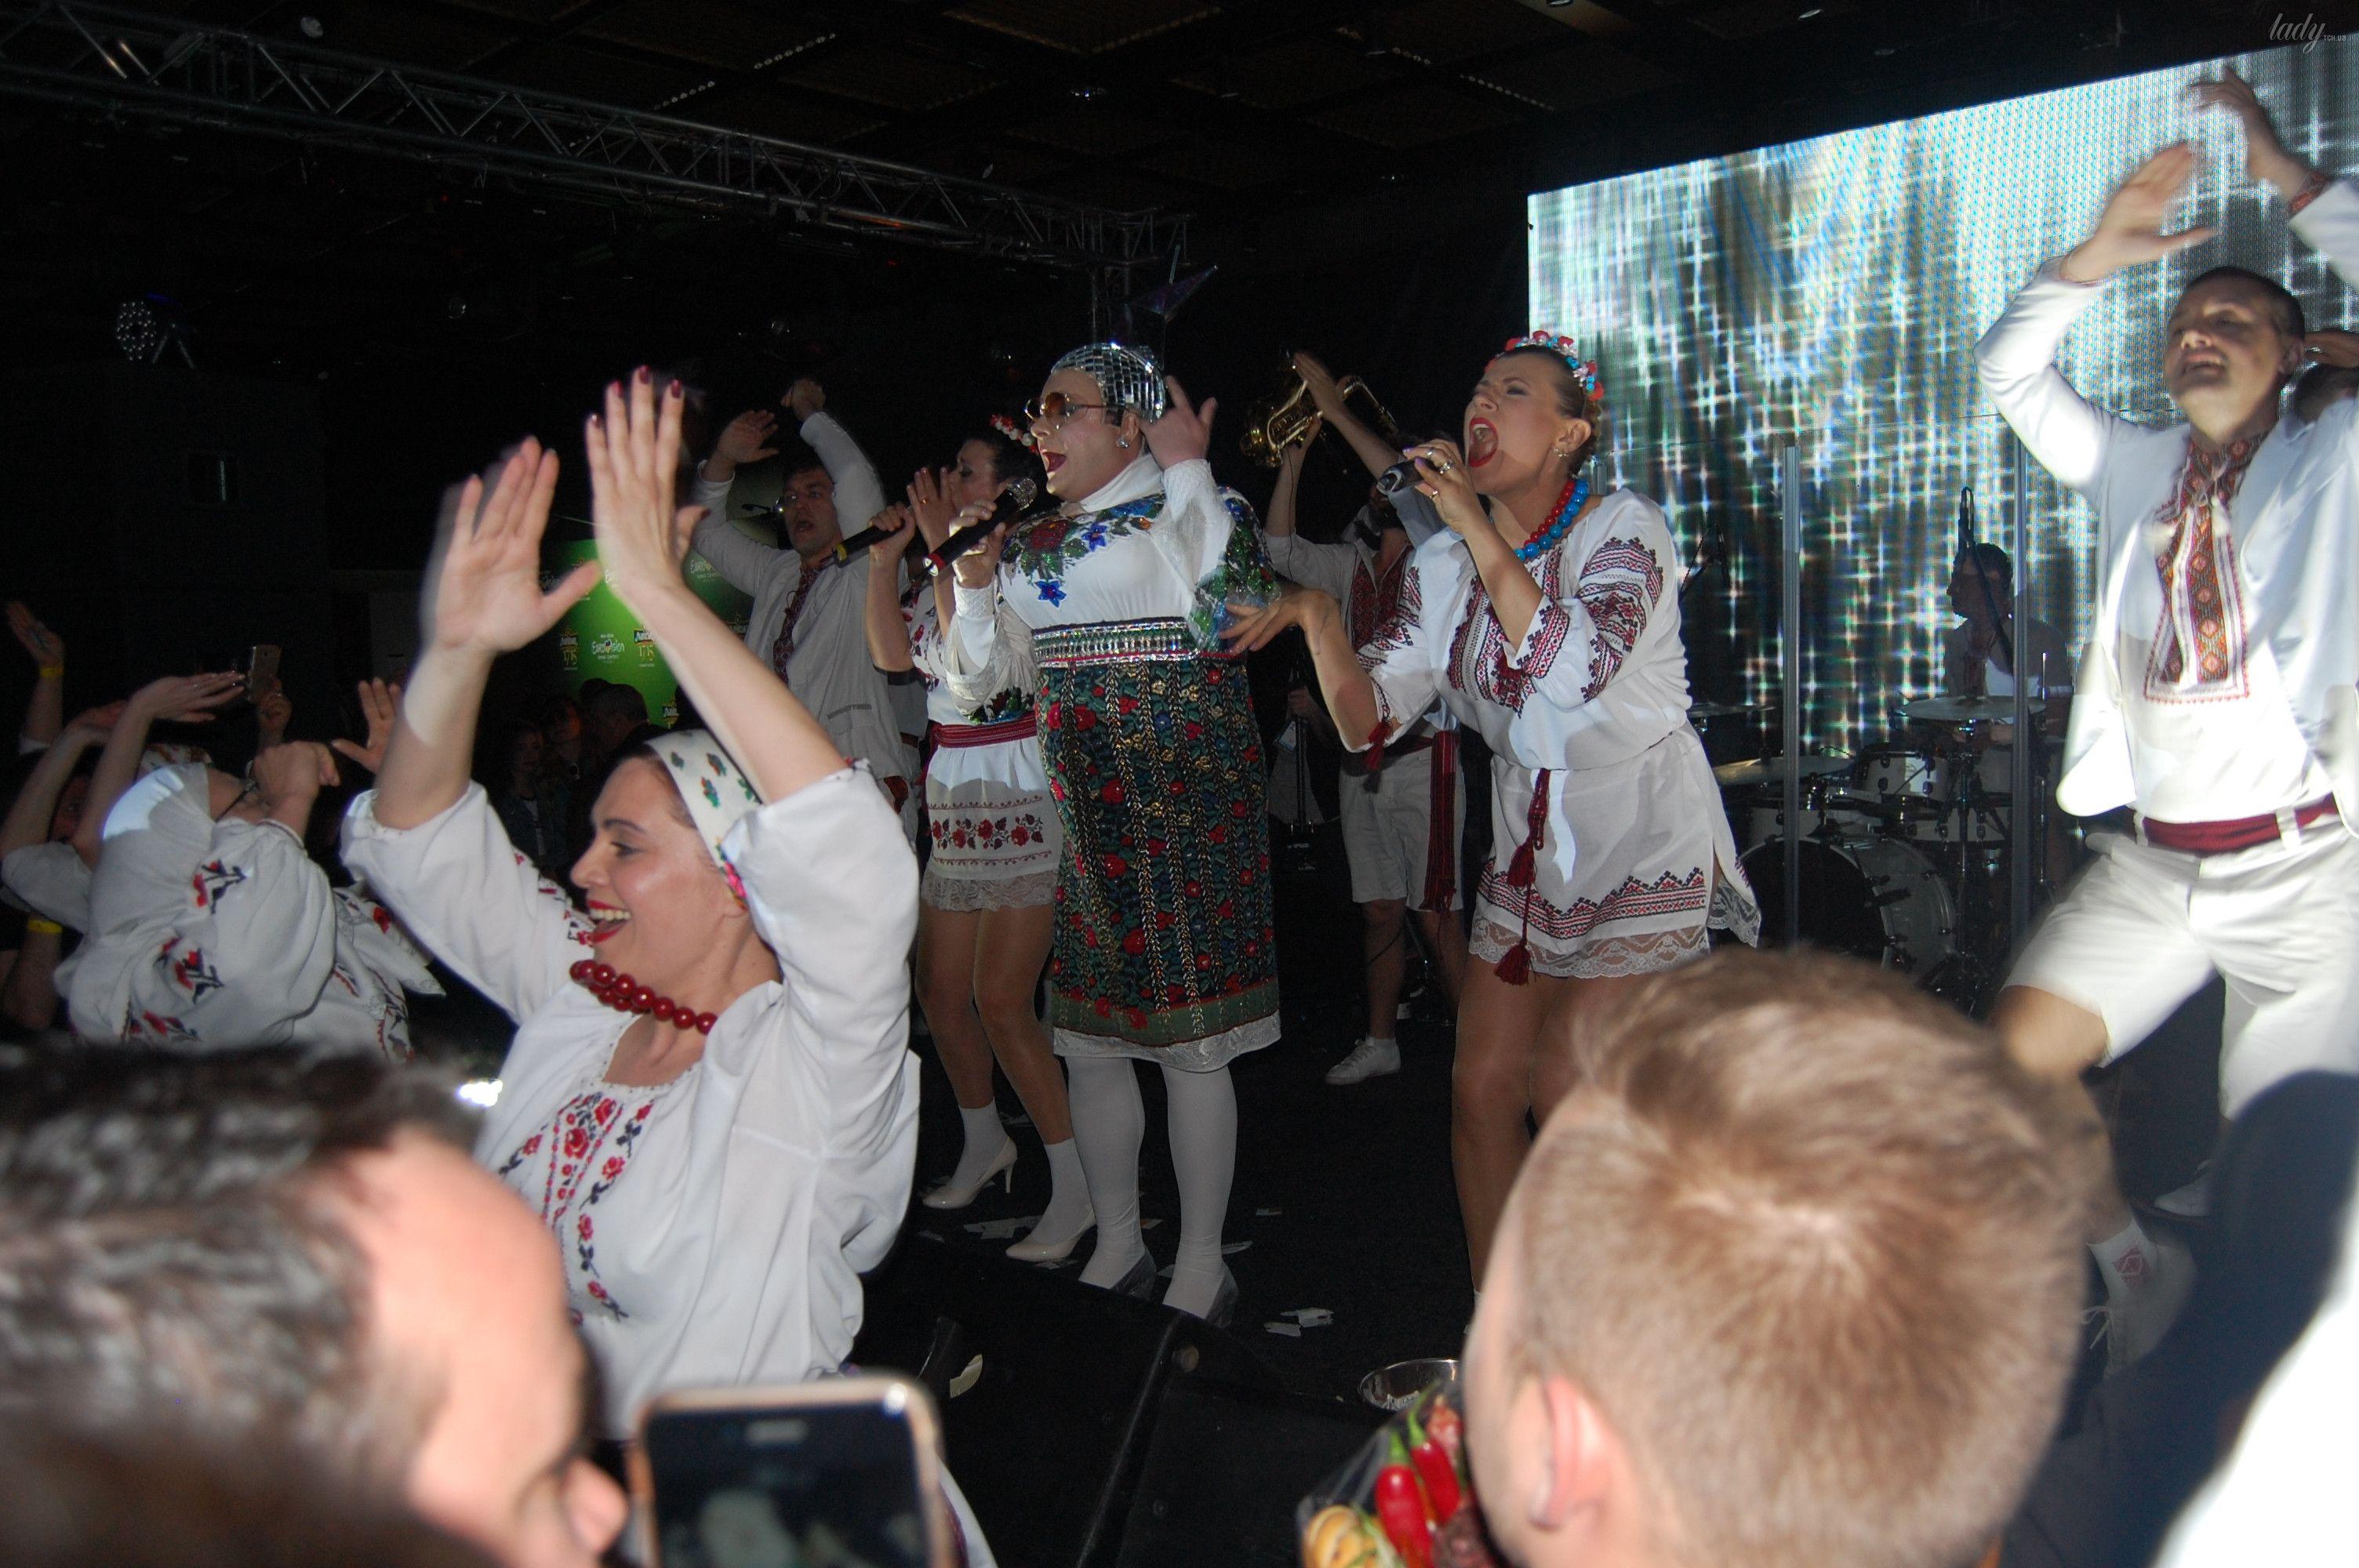 Верка Сердючка на вечеринке в EuroClub_1